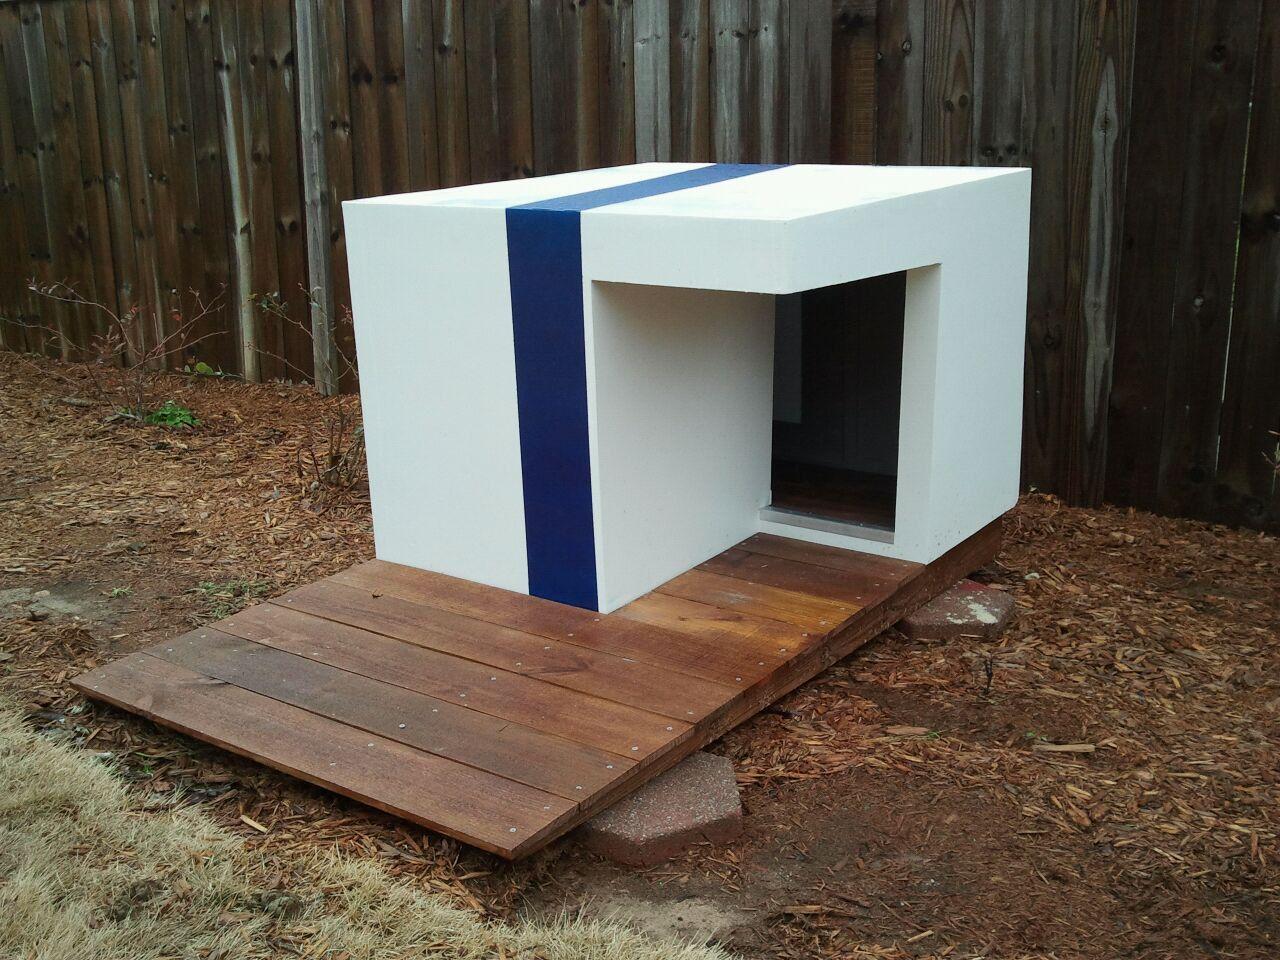 best gifts for dog lovers images on pinterest  dog lovers  - modern dog house